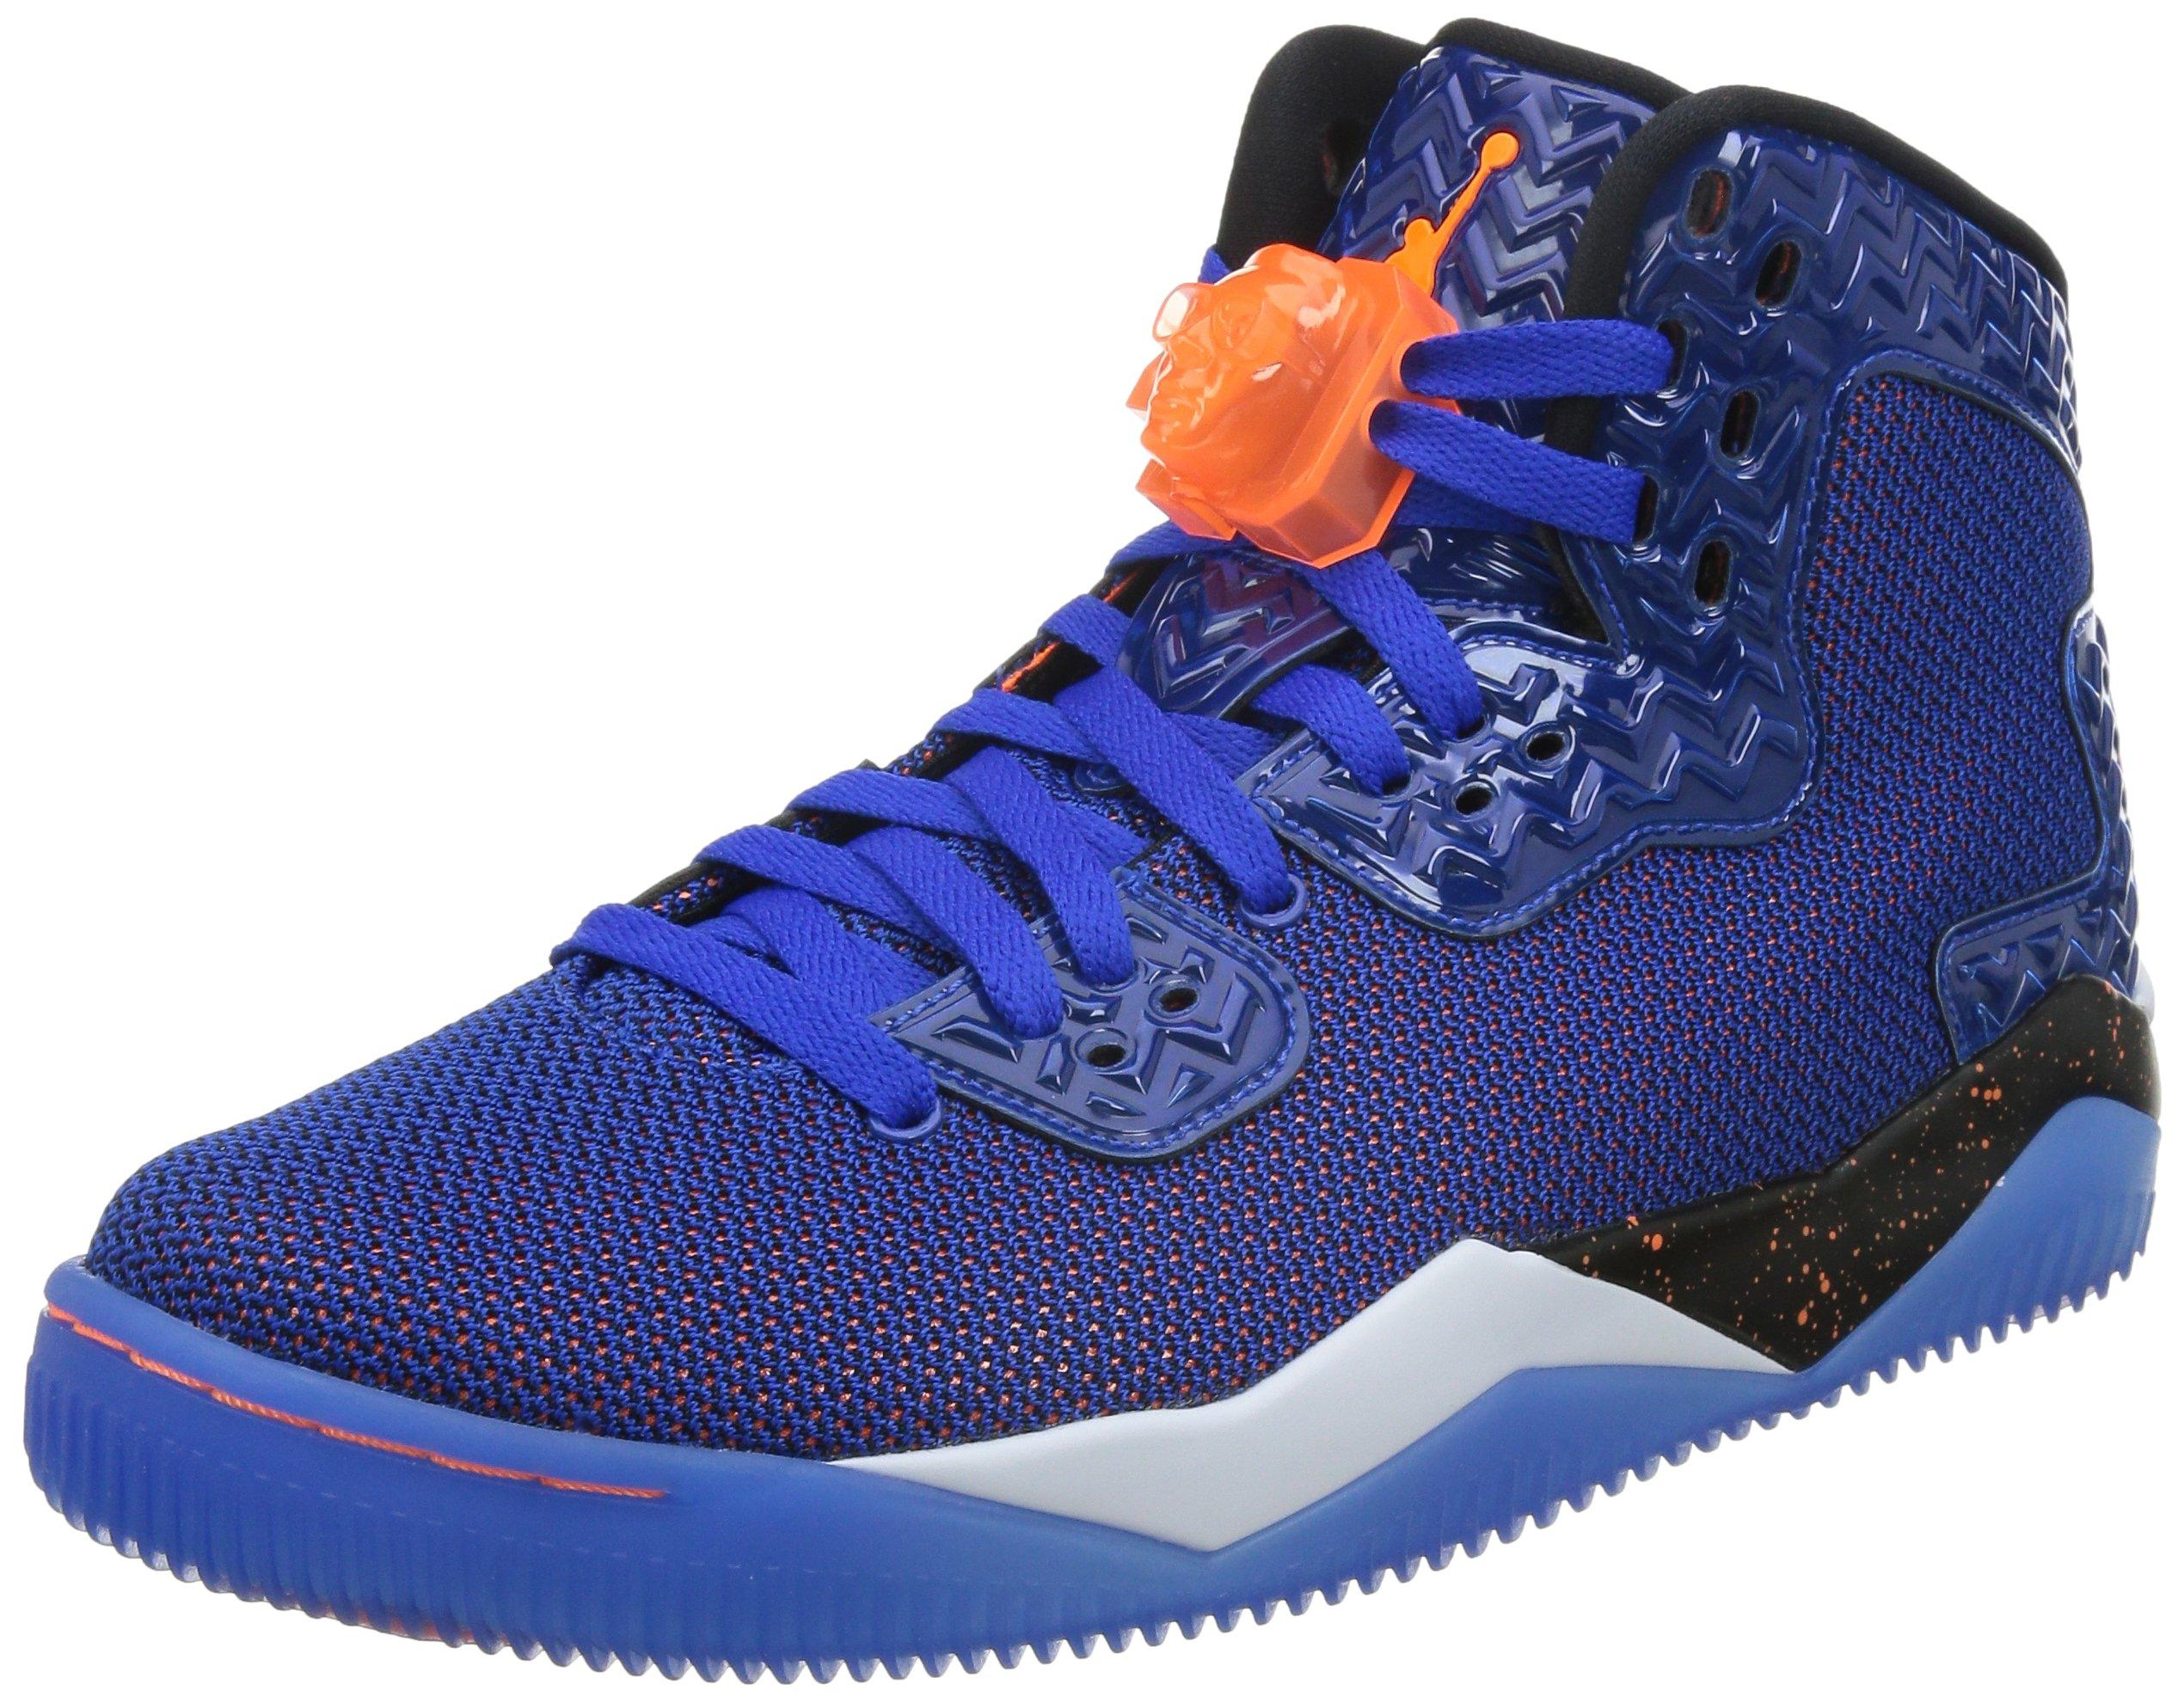 sale retailer 09b82 0bfcf Galleon - Nike Air Jordan Spike Forty Pe Mens Basketball Trainers 807541  Sneakers Shoes (10 US, Game Royal Total Orange White Black 405)